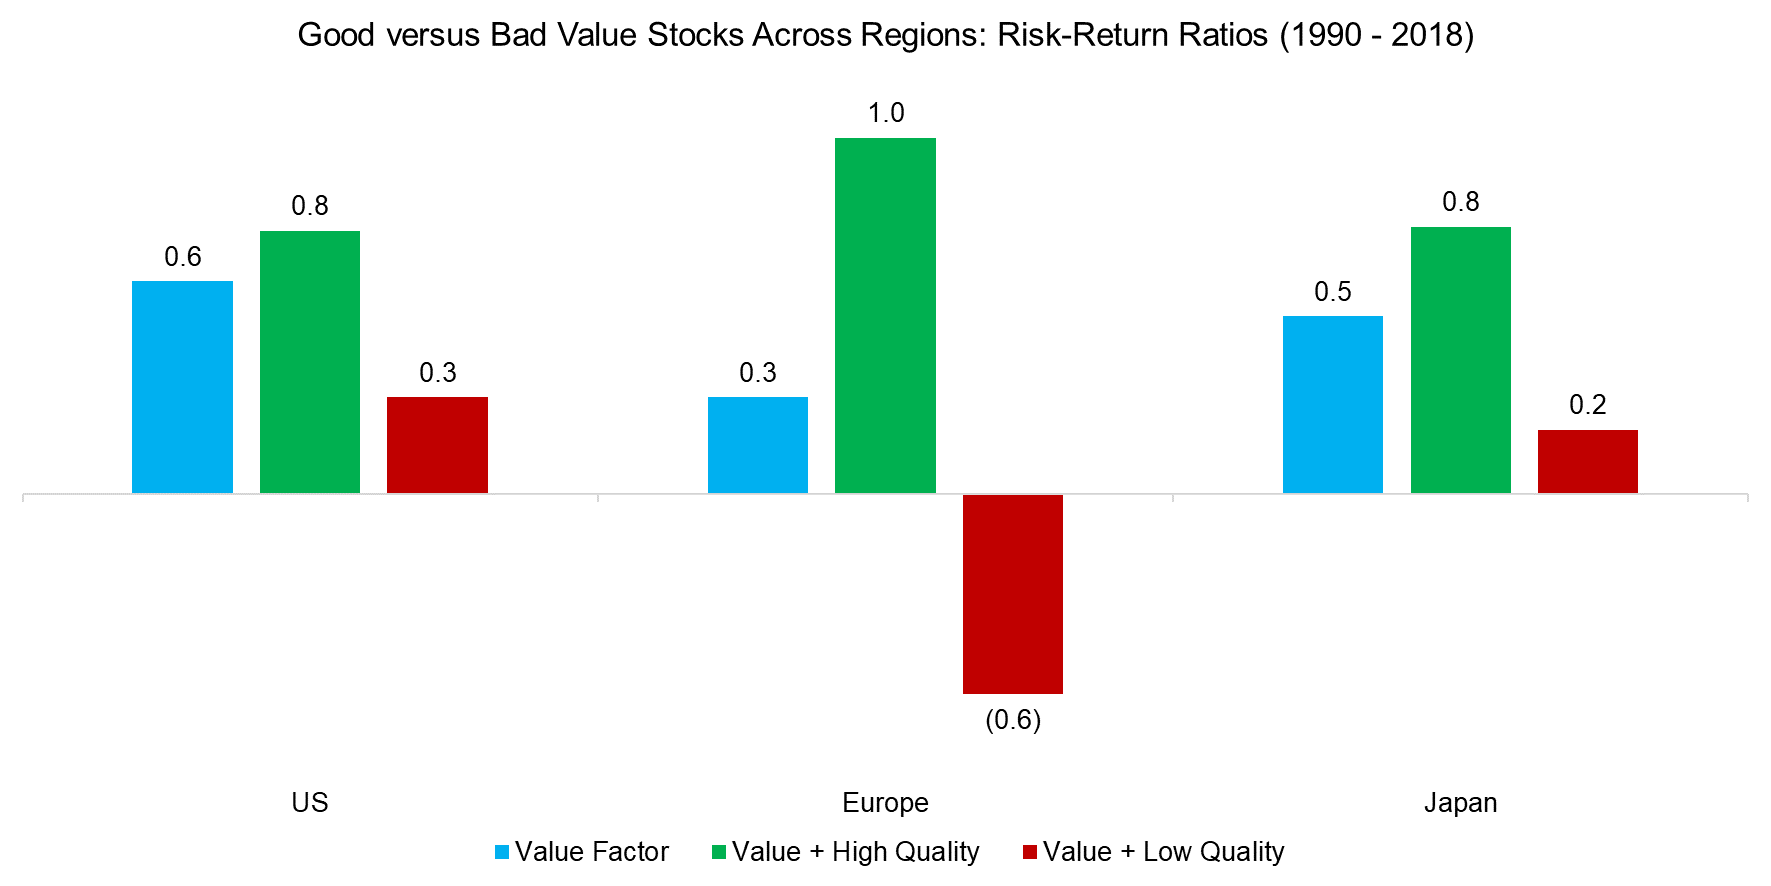 Good versus Bad Value Stocks Across Regions Risk-Return Ratios (1990 - 2018)